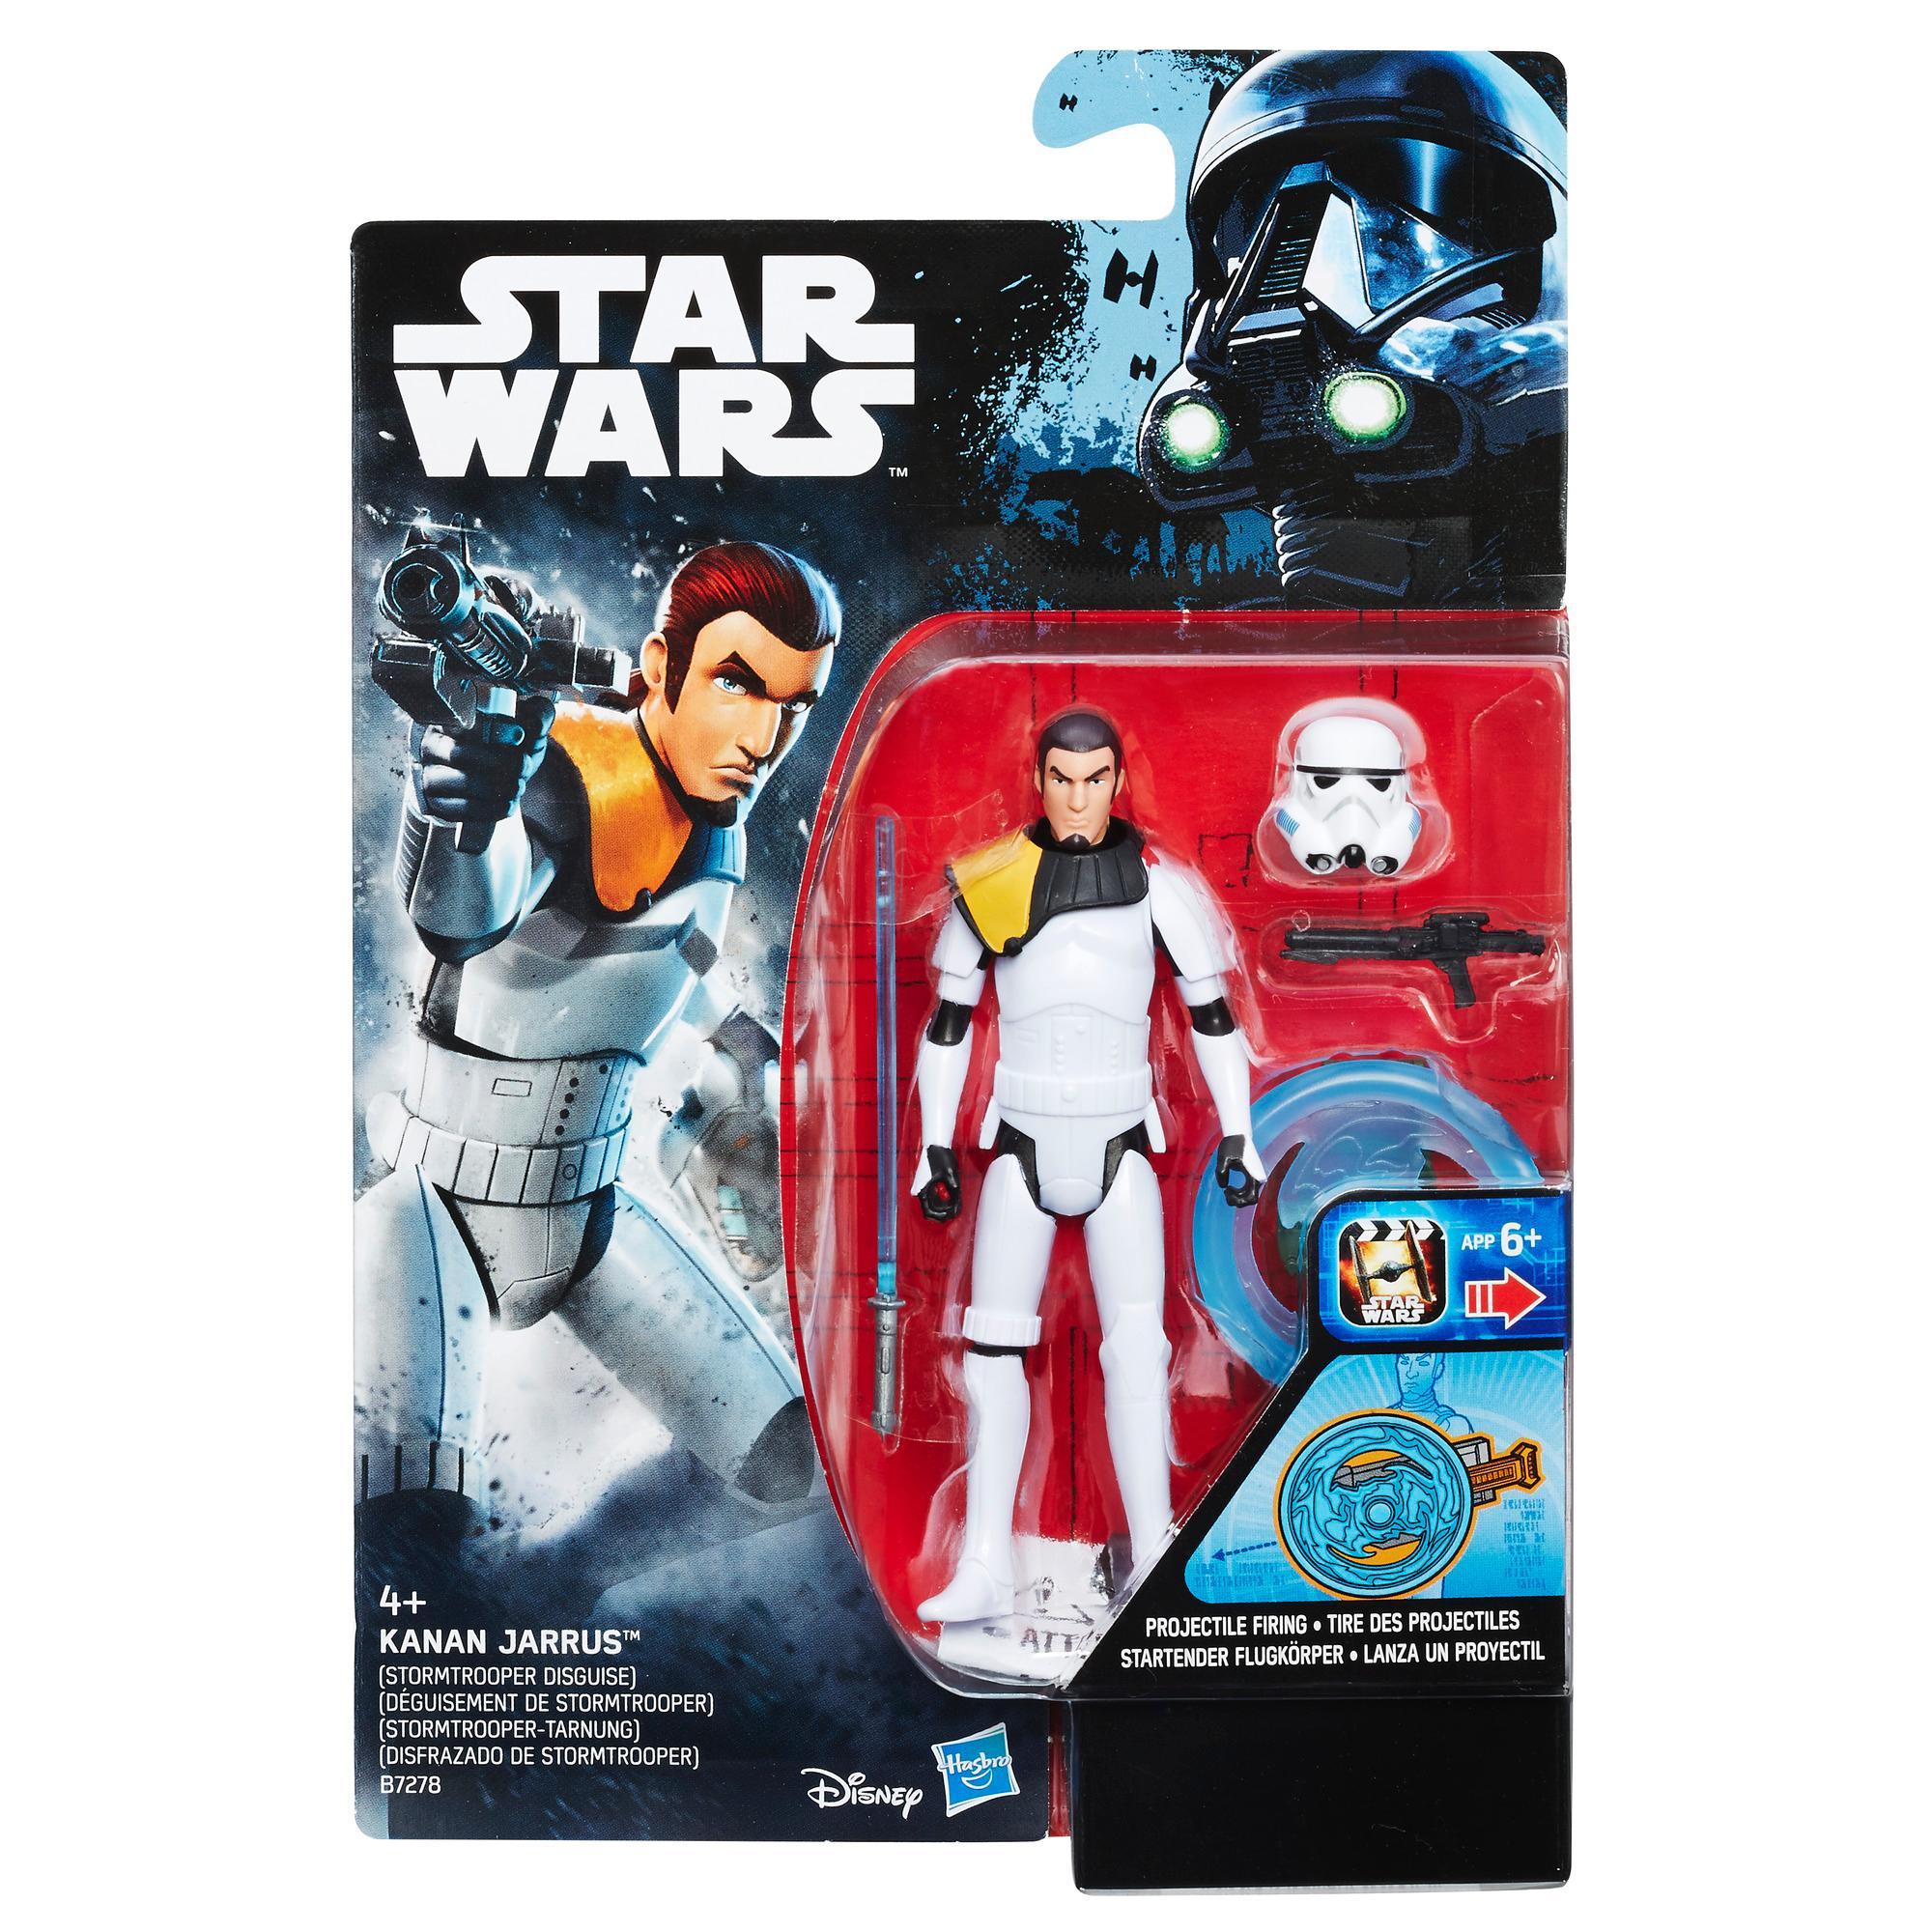 Star Wars Rebels Kanan Jarrus (Stormtrooper Disguise) Figure